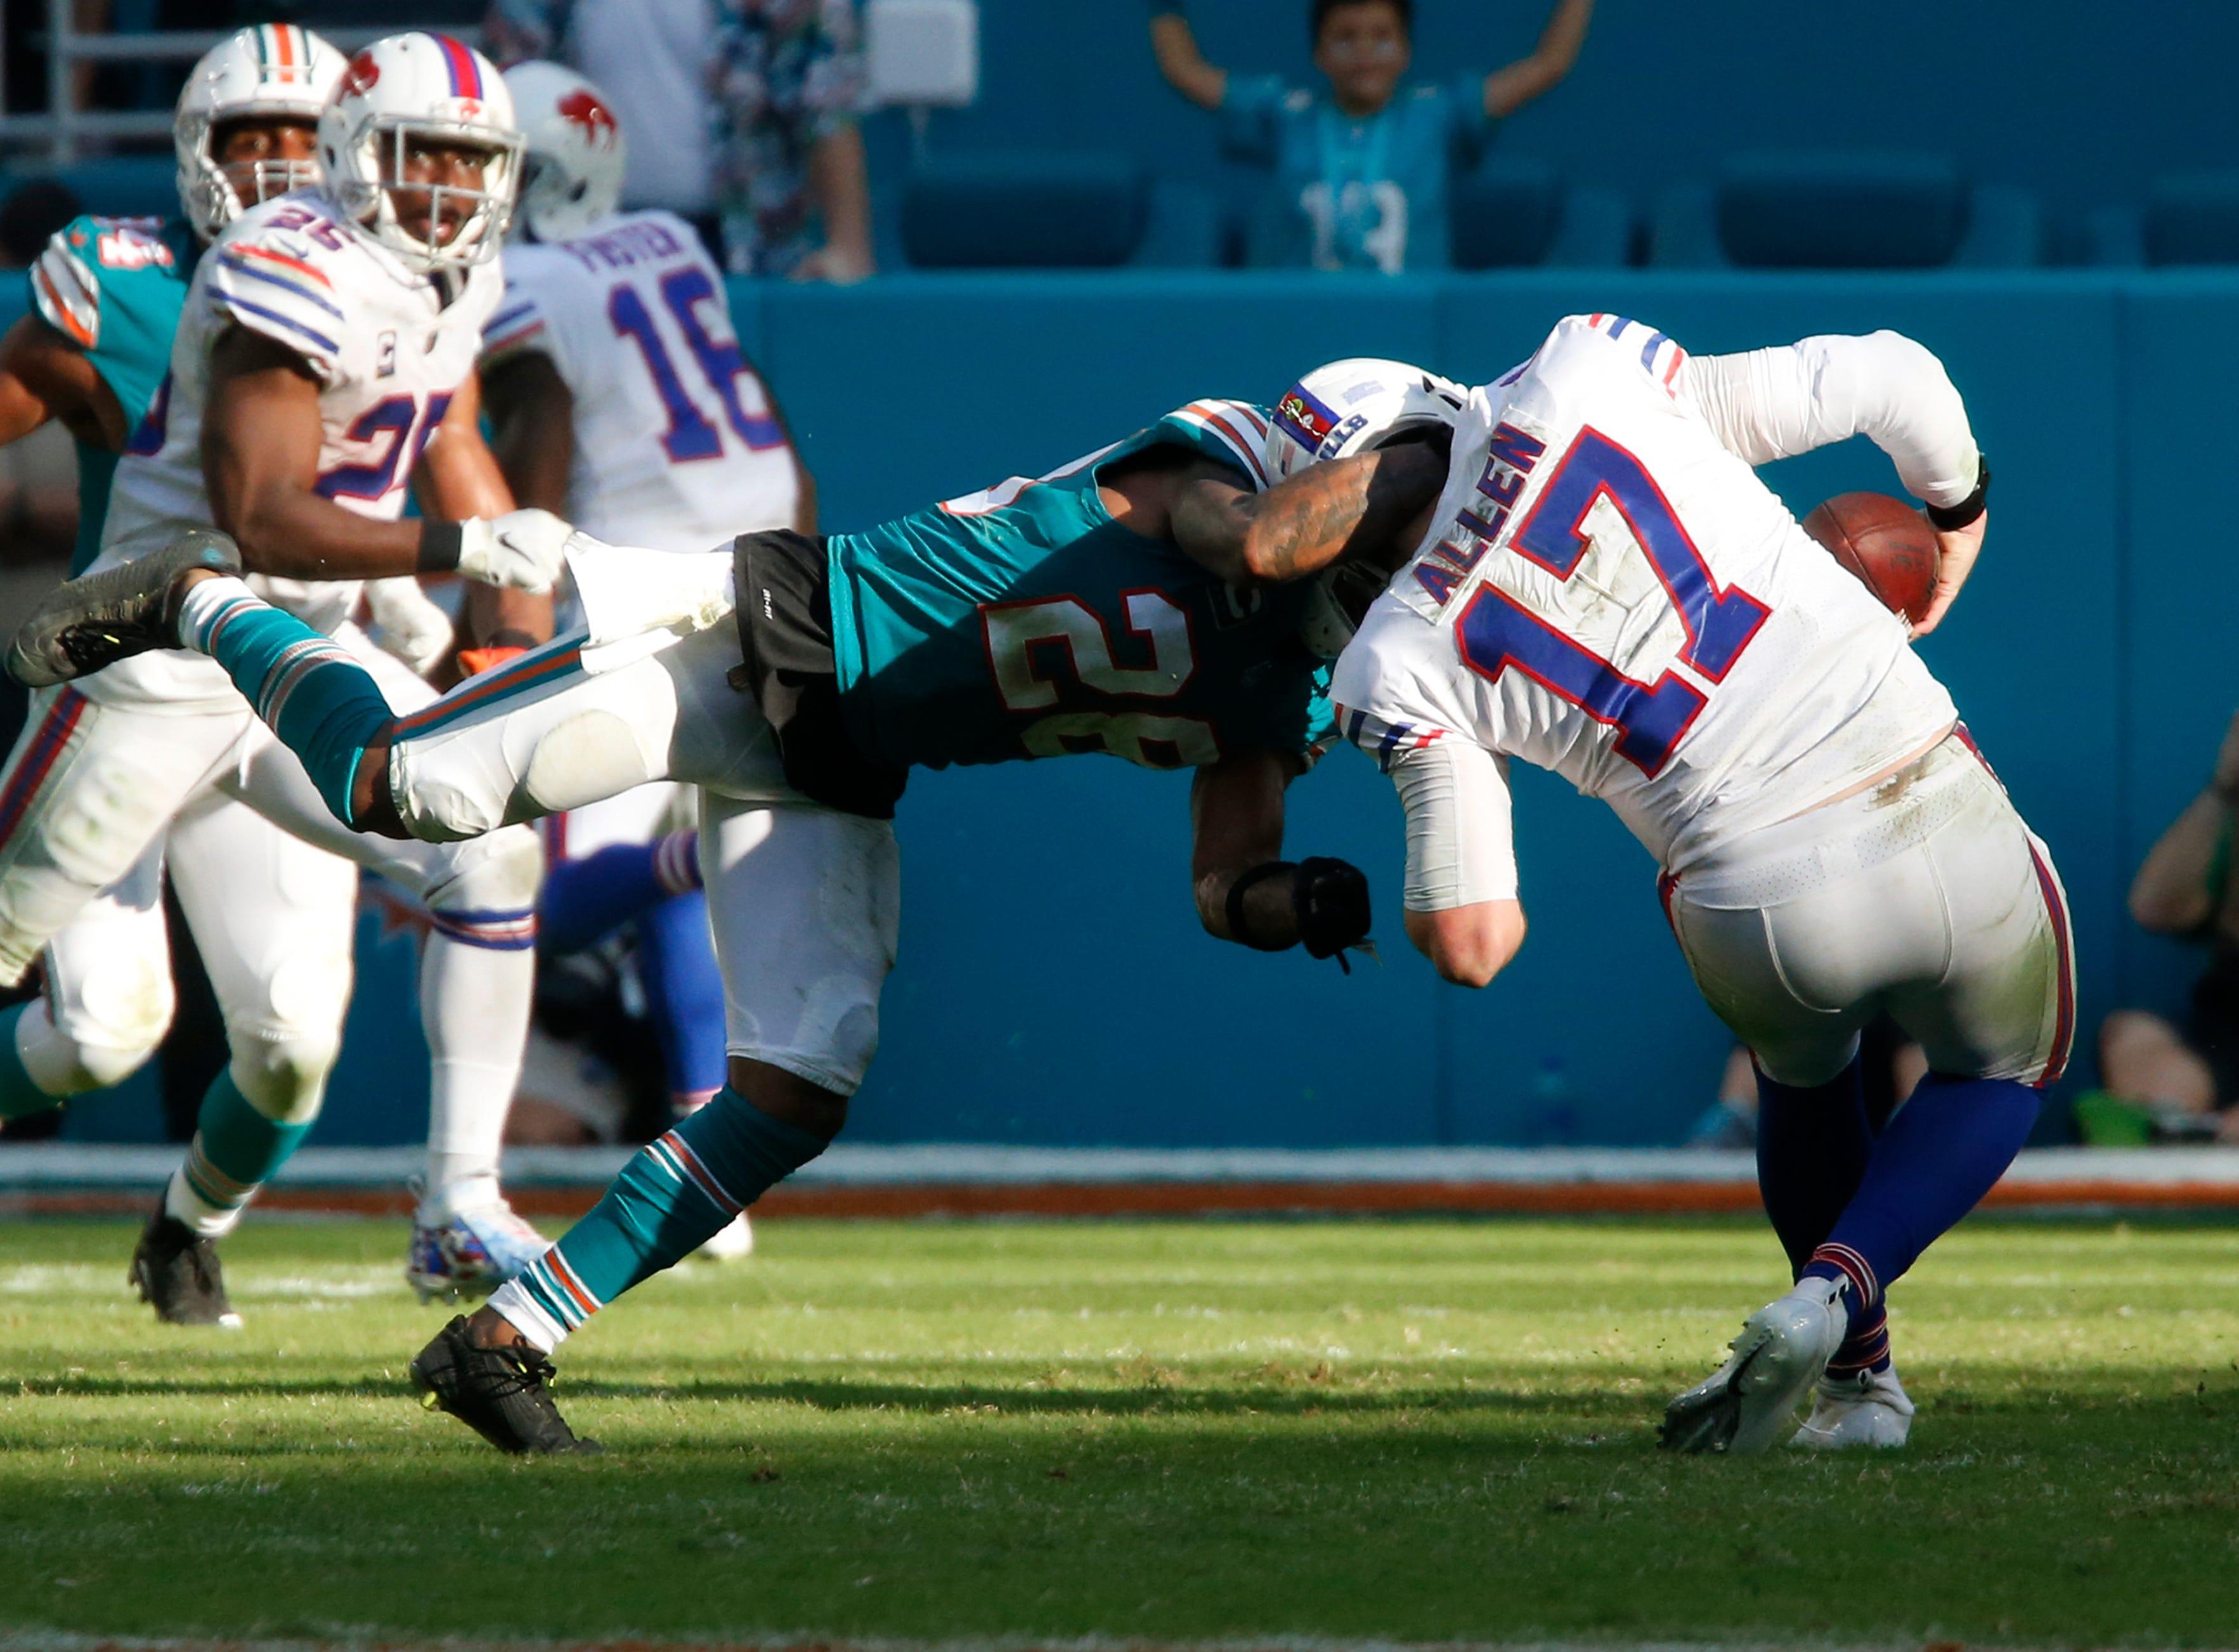 Miami Dolphins cornerback Bobby McCain (28) sacks Buffalo Bills quarterback Josh Allen (17), during the second half of an NFL football game, Sunday, Dec. 2, 2018, in Miami Gardens, Fla. The Dolphins defeated the Bills 21-17. (AP Photo/Joel Auerbach)